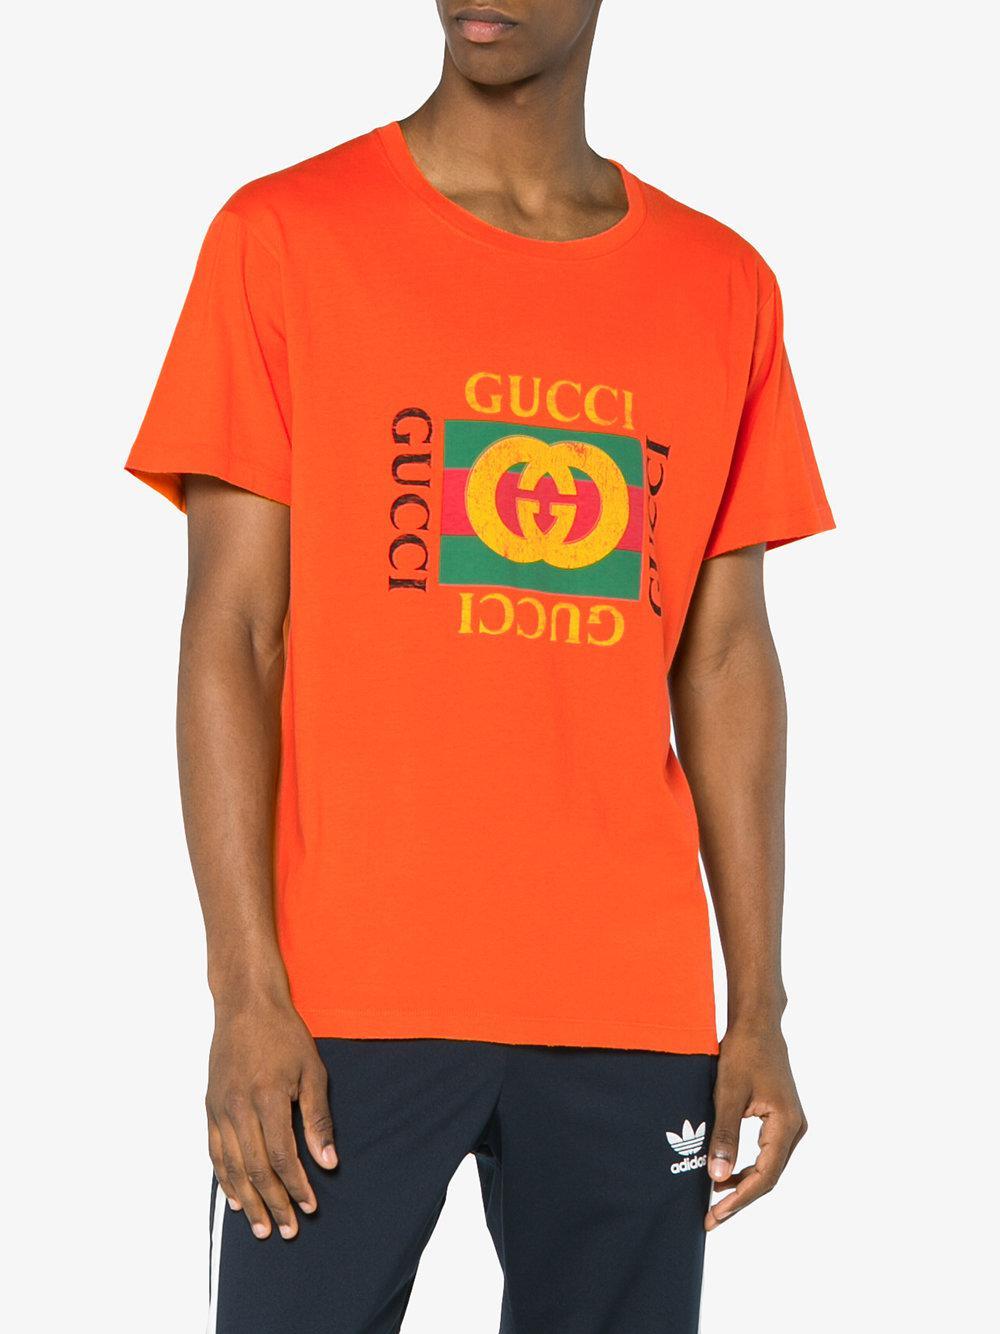 b5b0140b4d2 Gucci Logo Print T Shirt in Orange for Men - Lyst